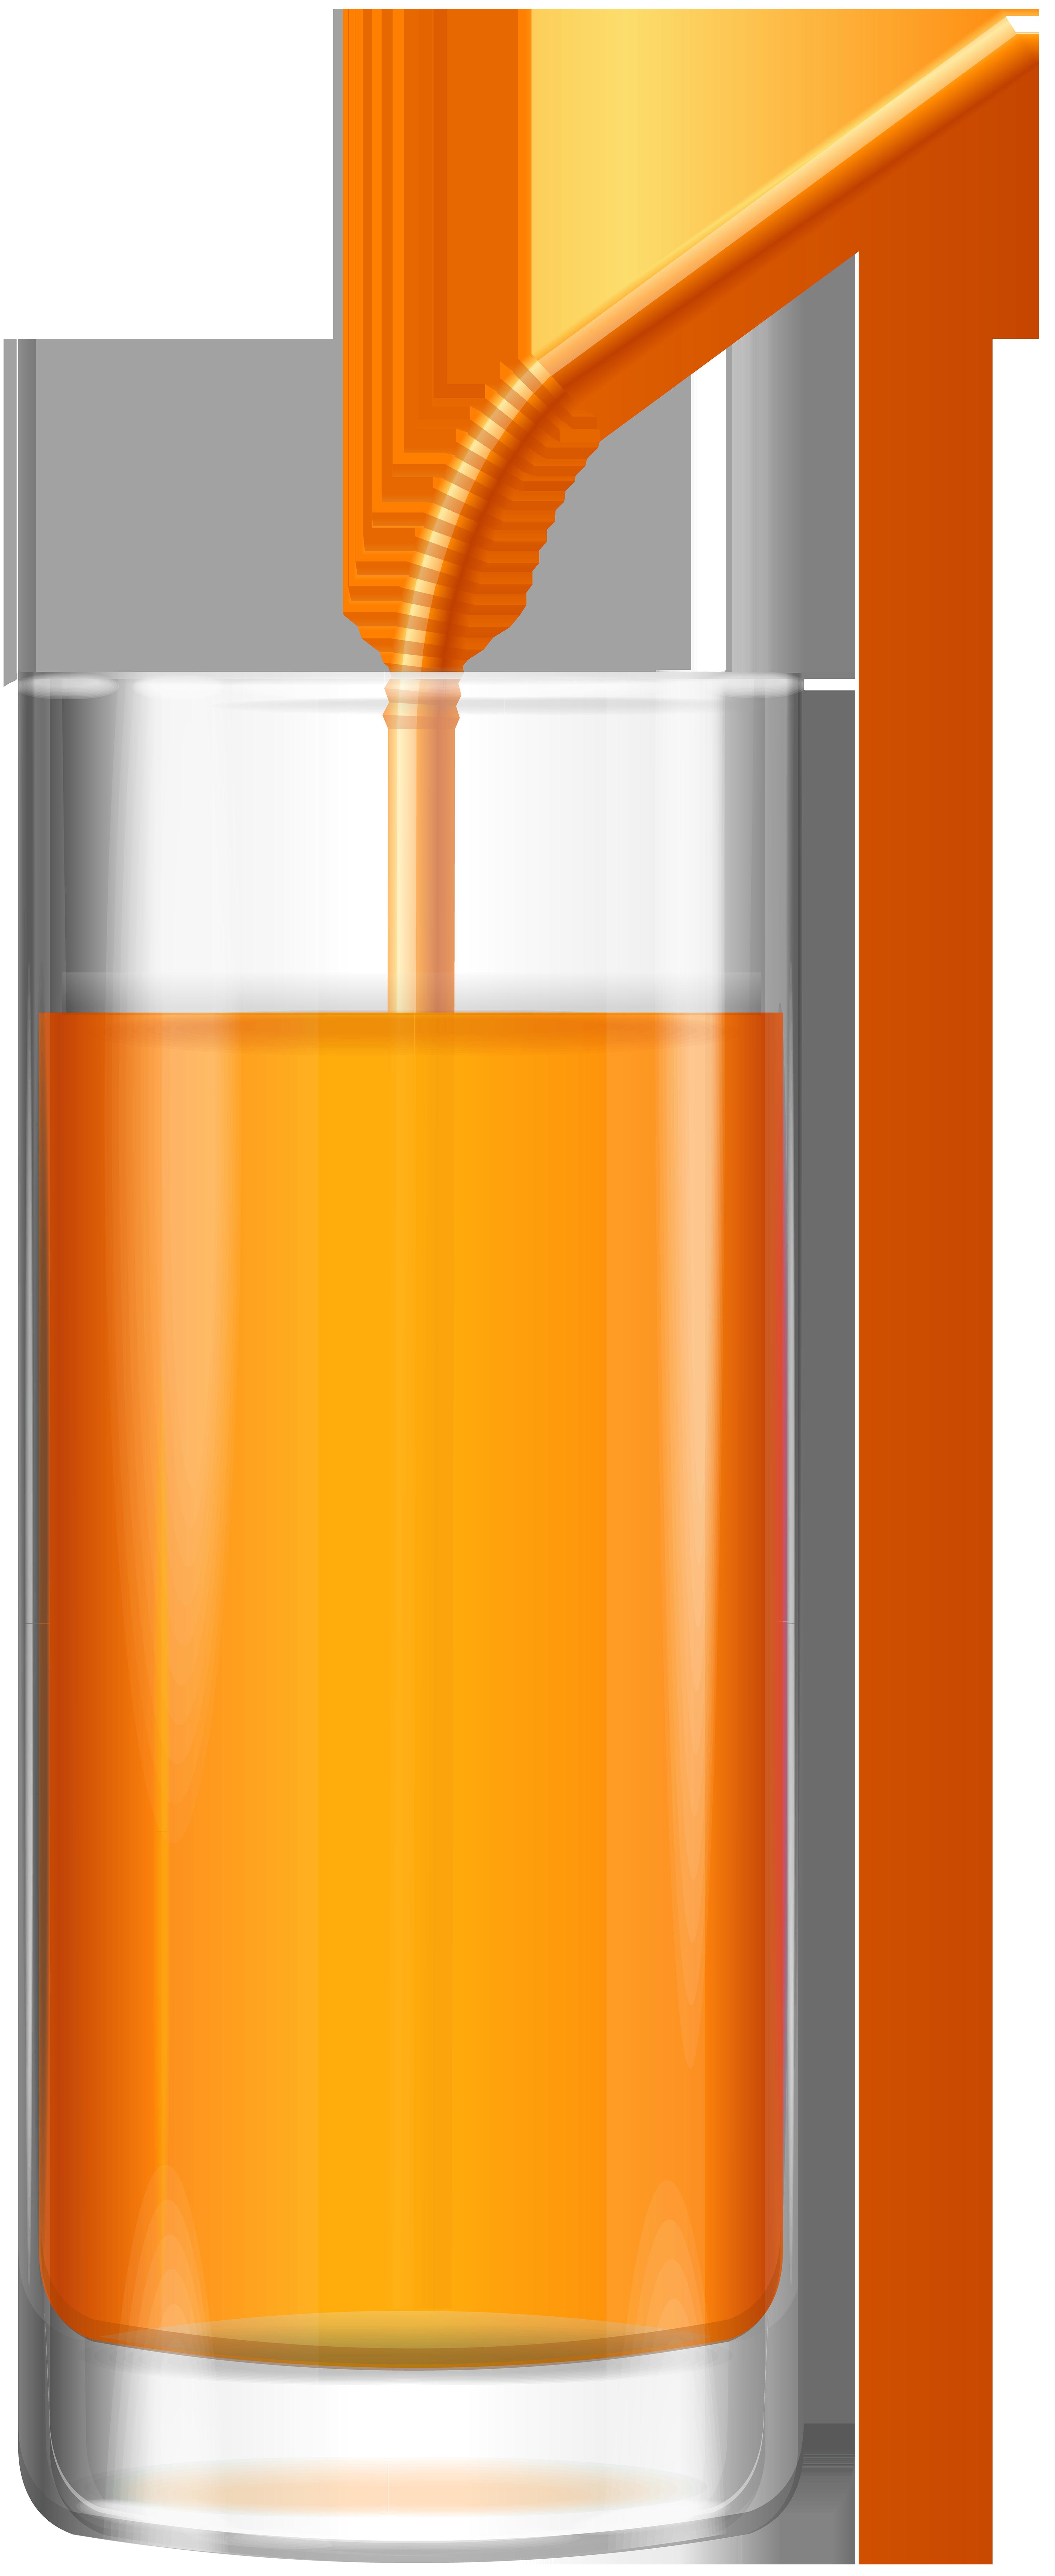 Drink clipart drinking juice. Orange png clip art